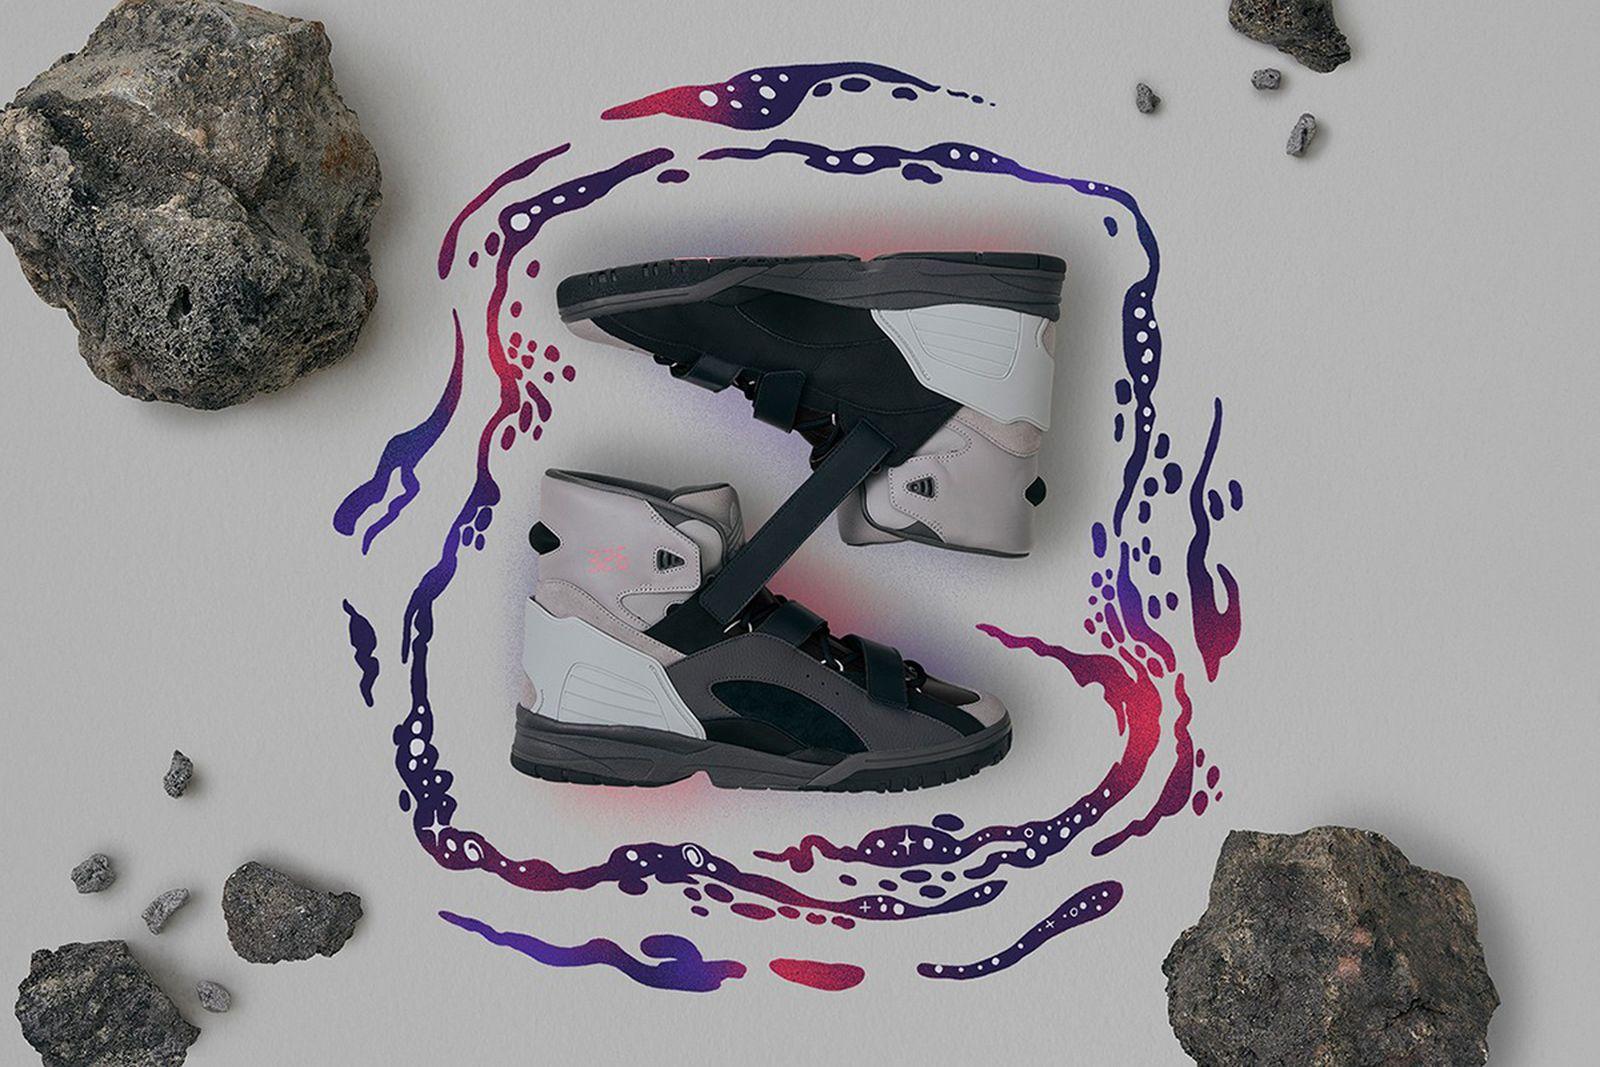 kid-cudi-adidas-vadawam-326-release-date-price-07